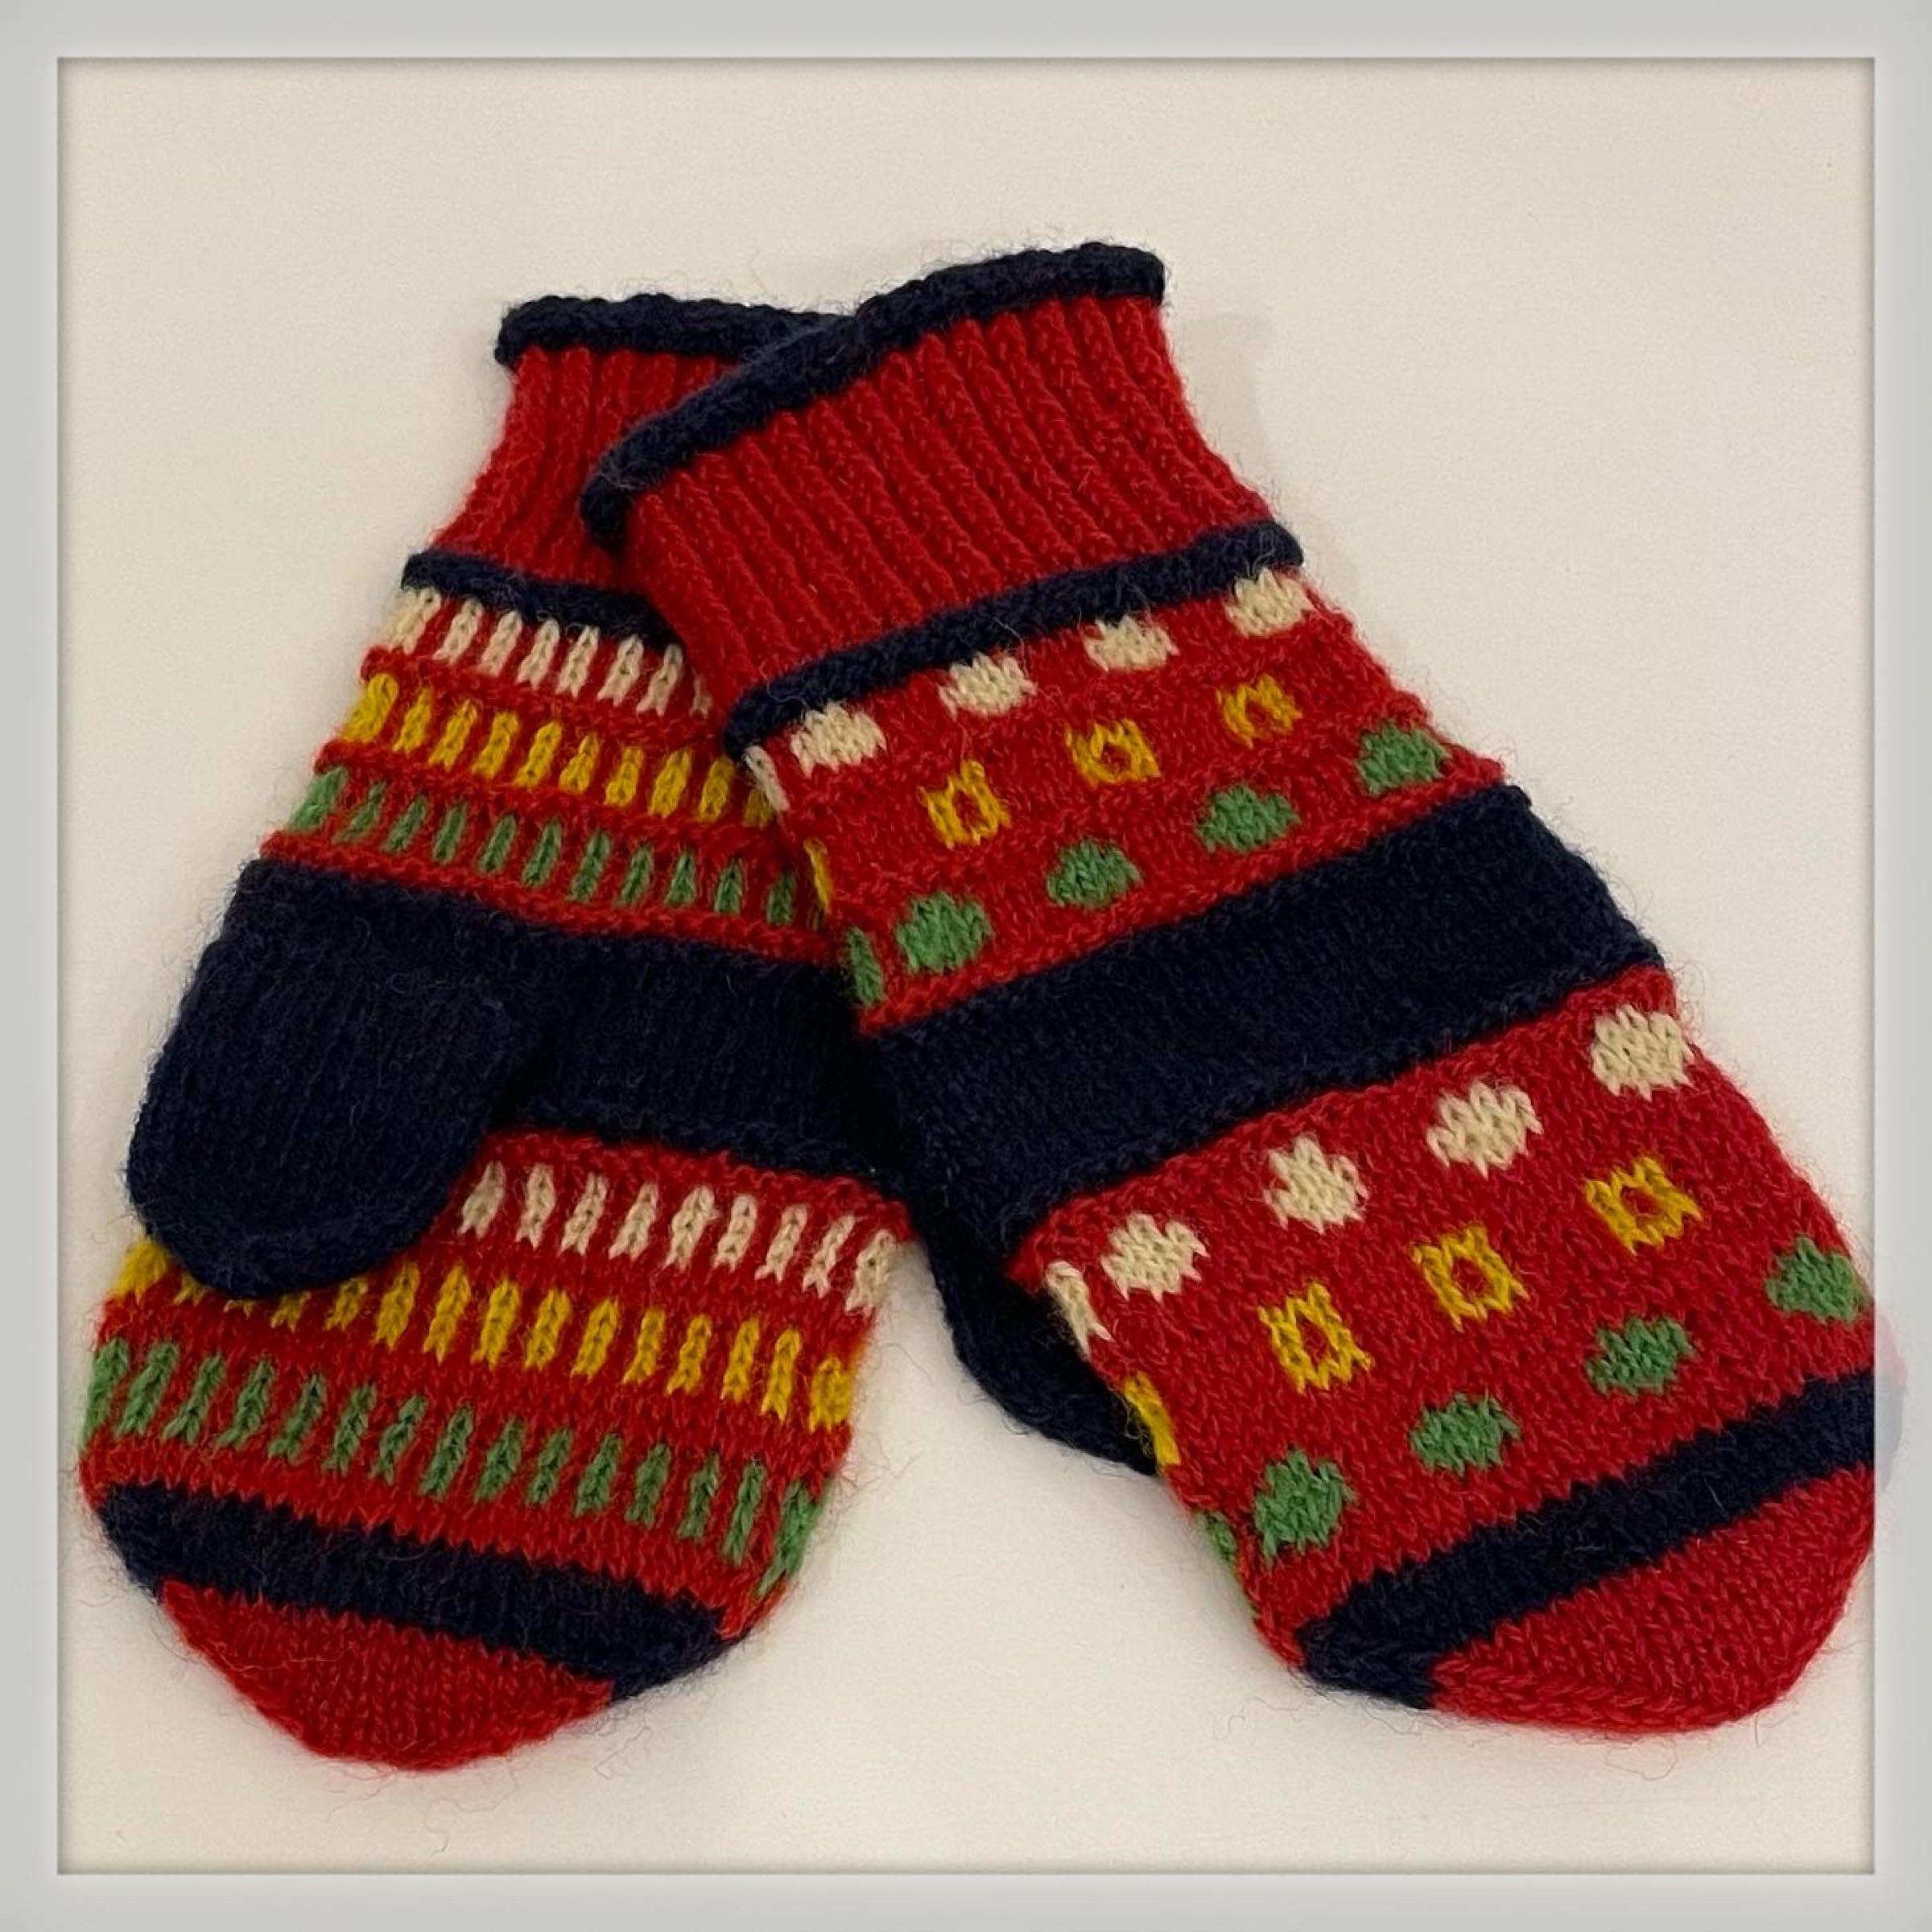 Hand-knitted Organic Mittens by Vladanka